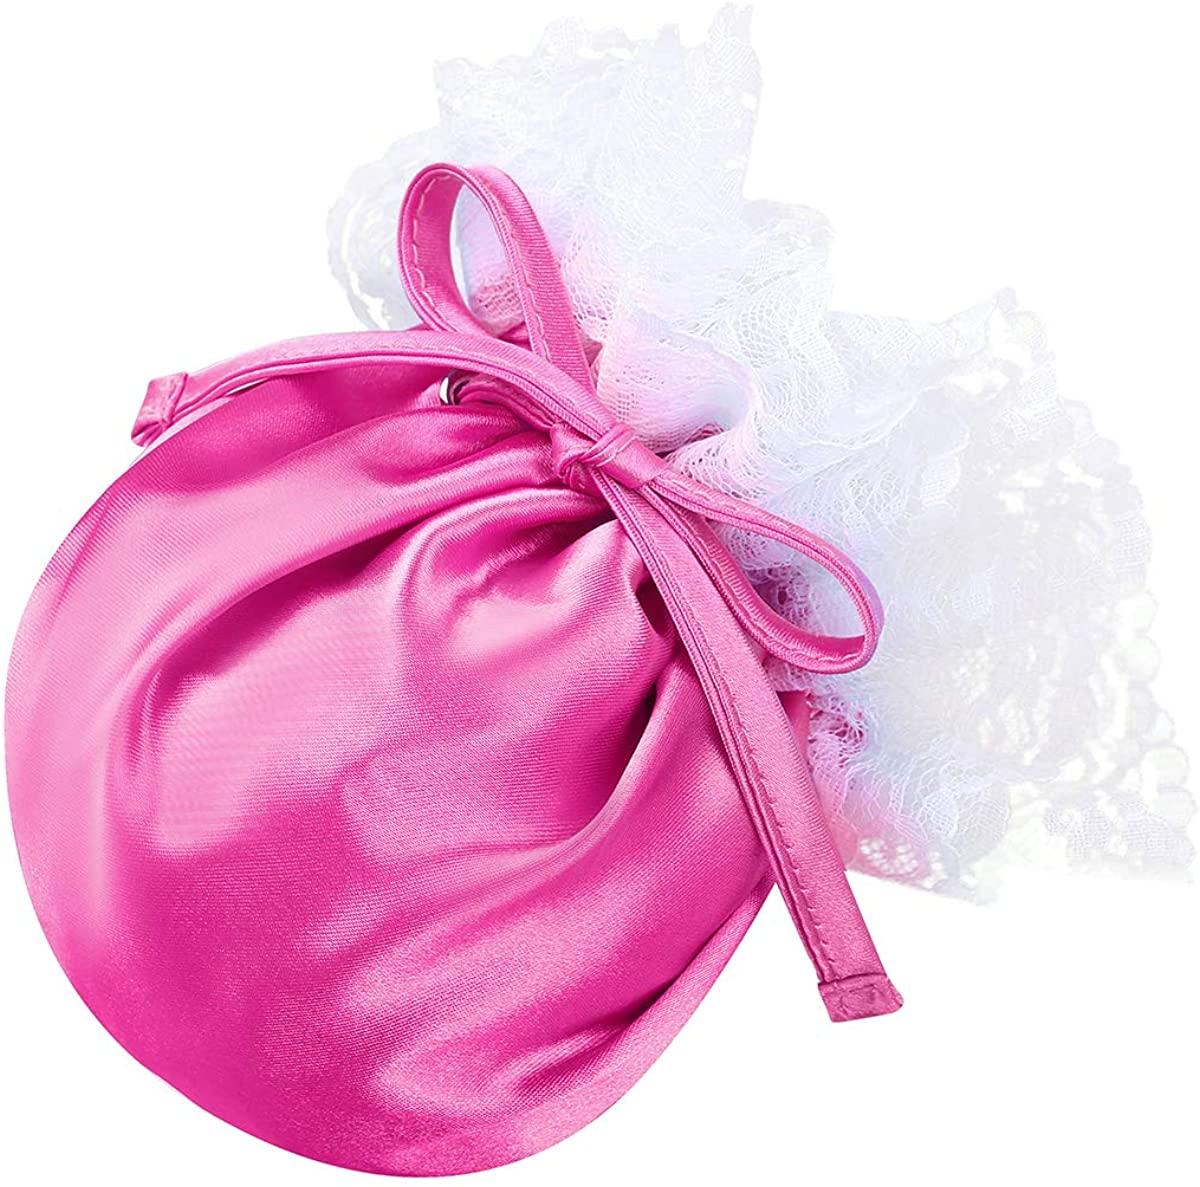 YOOJIA Men's Satin Floral Lace Drawstring Bulge Pouch Sissy Crossdress Panties C-String Briefs Underwear